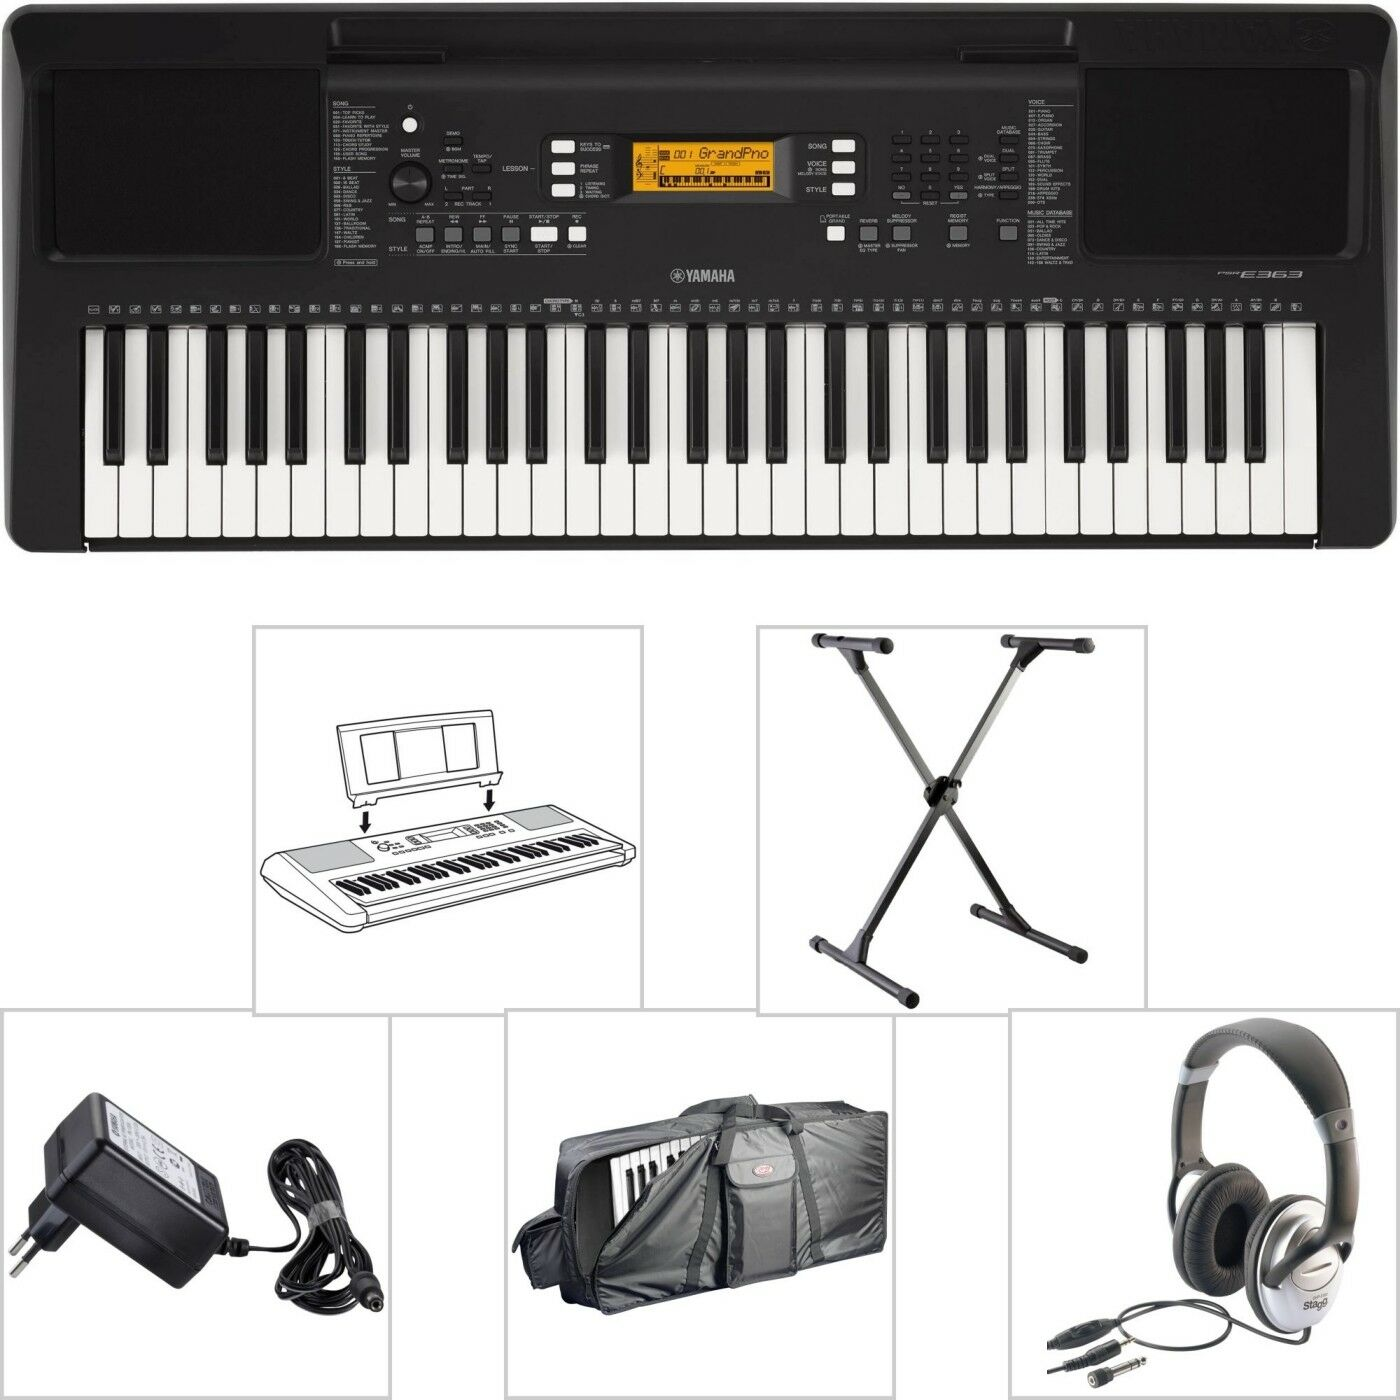 Yamaha PSR E363 Keyboard + Tasche + X-Stativ + Kopfhörer + Netzgerät + Notenpult